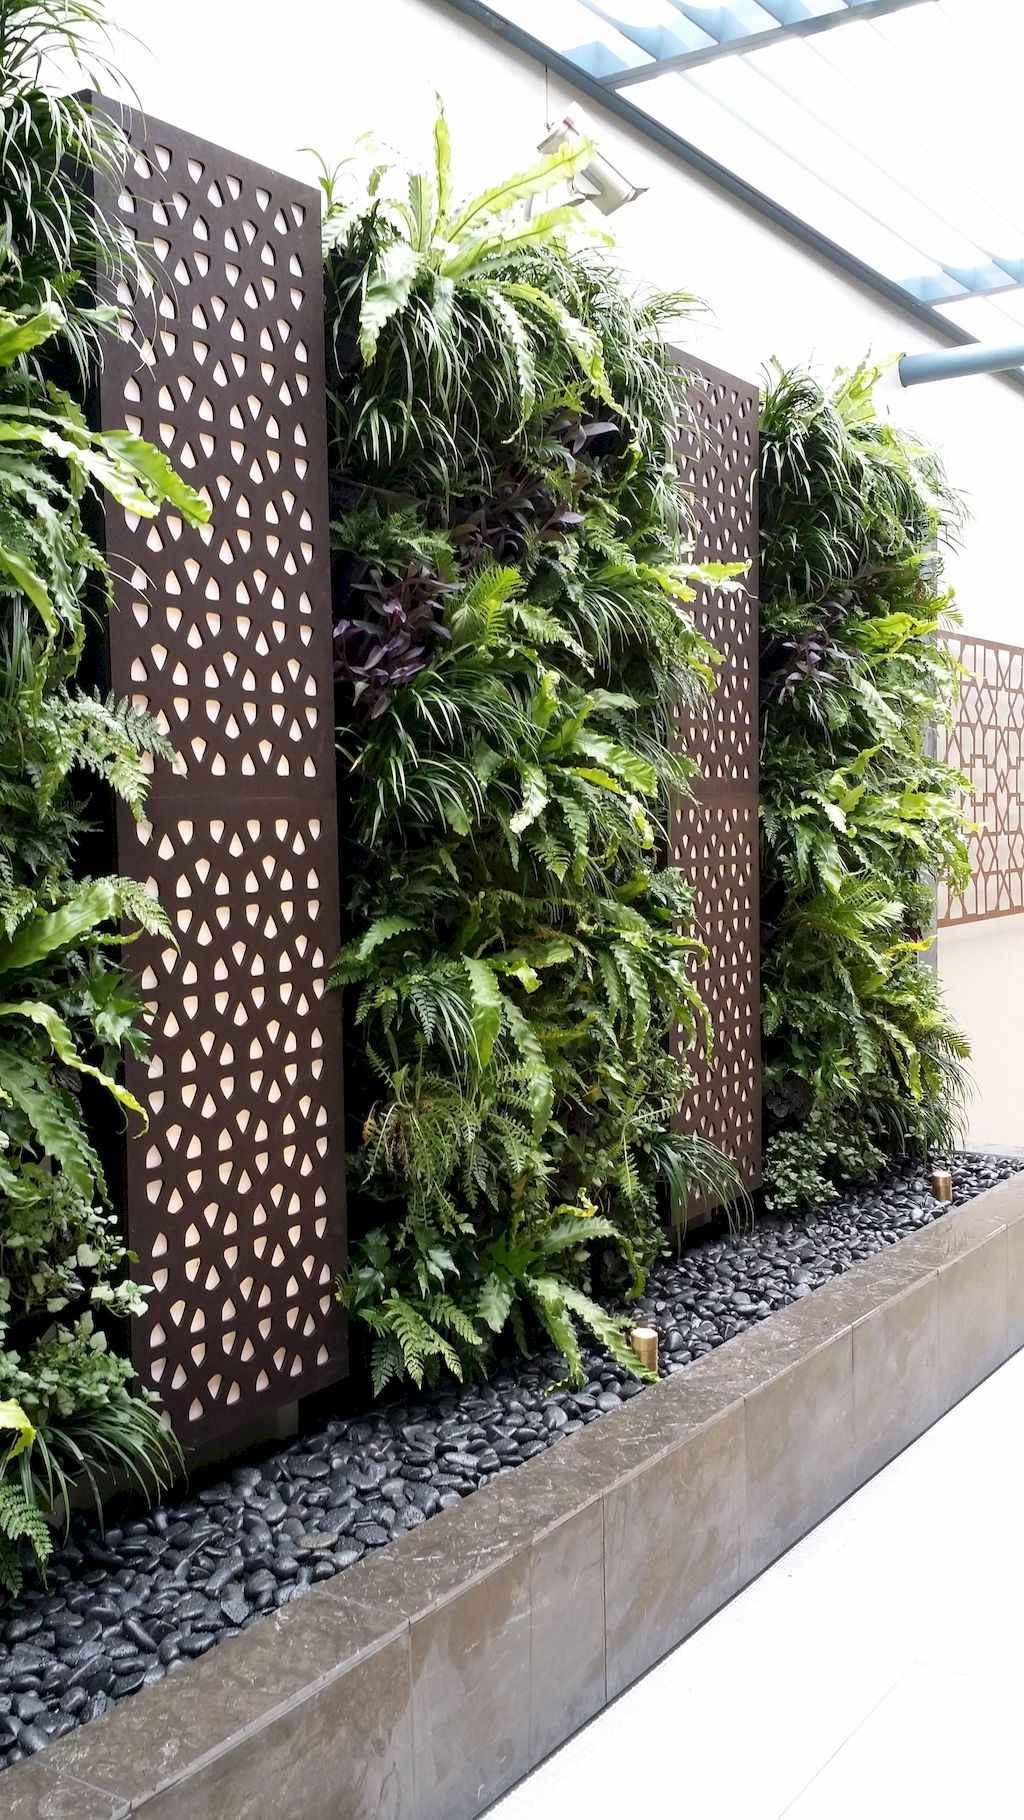 Gnome In Garden: 15 Amazing Diy Vertical Garden Design Ideas